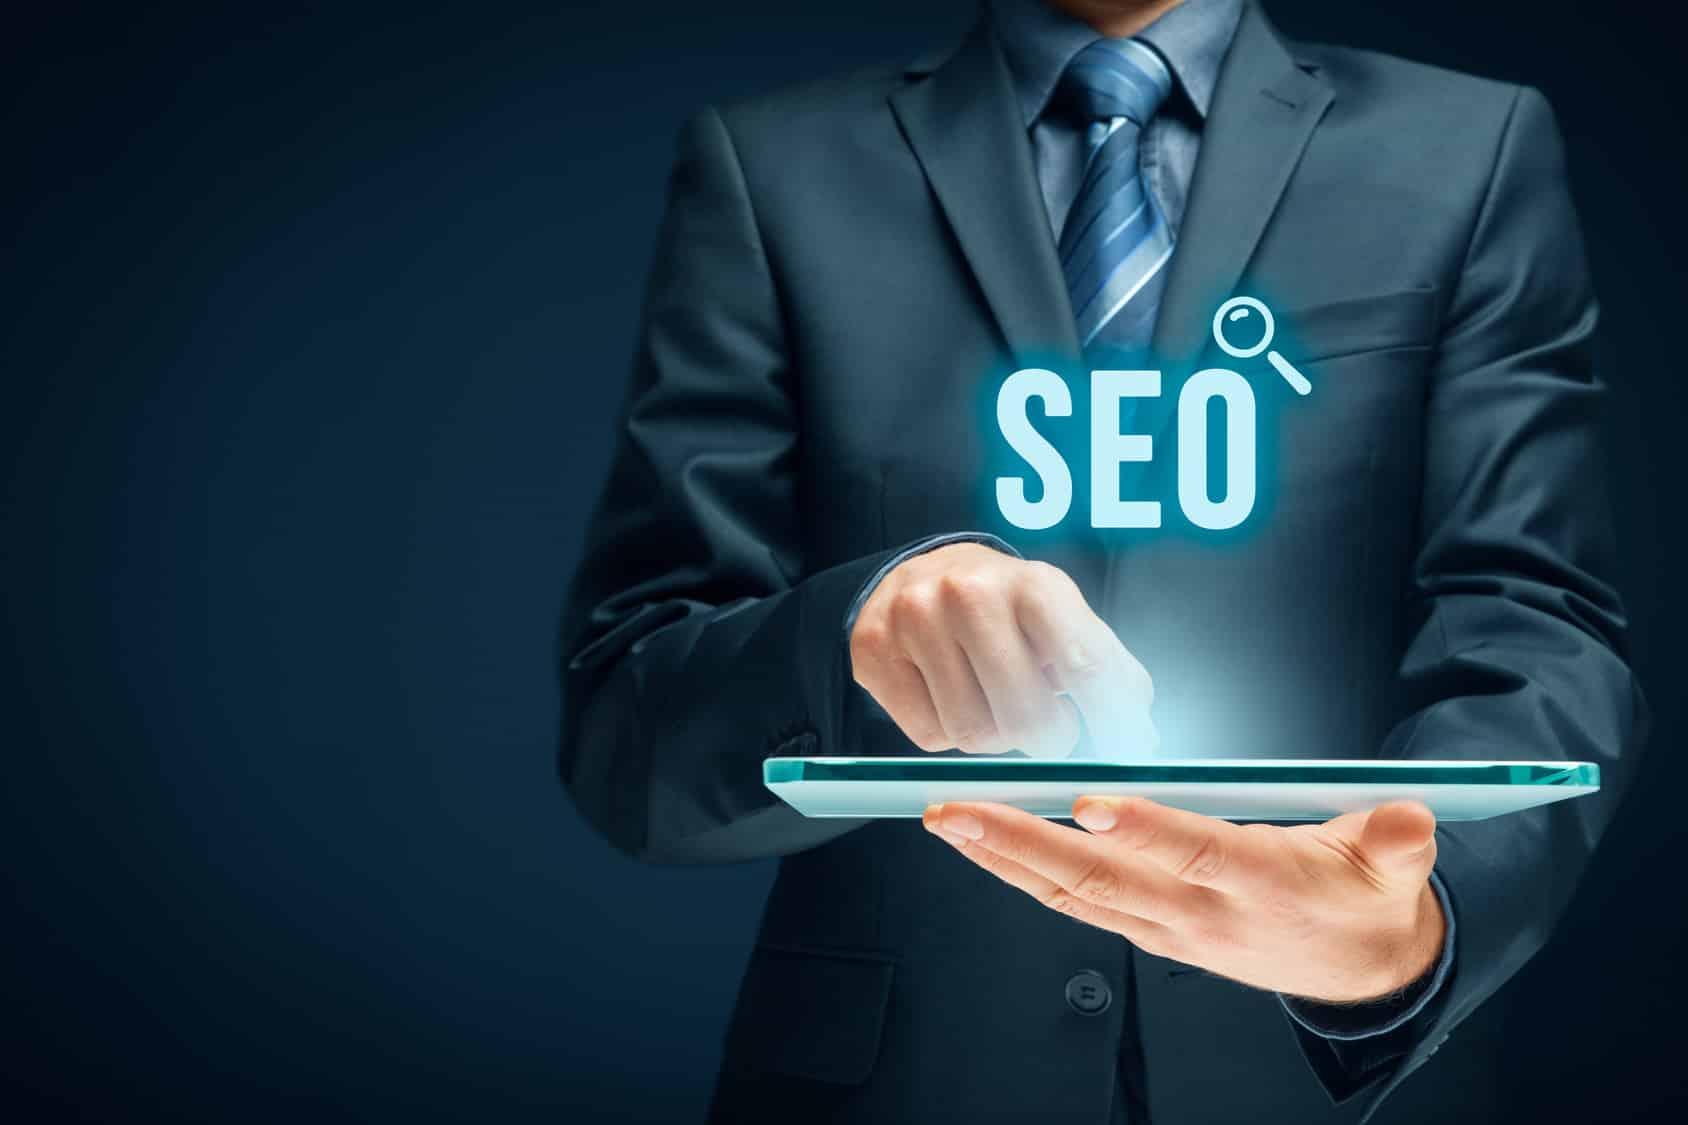 Apply Search Engine Optimization